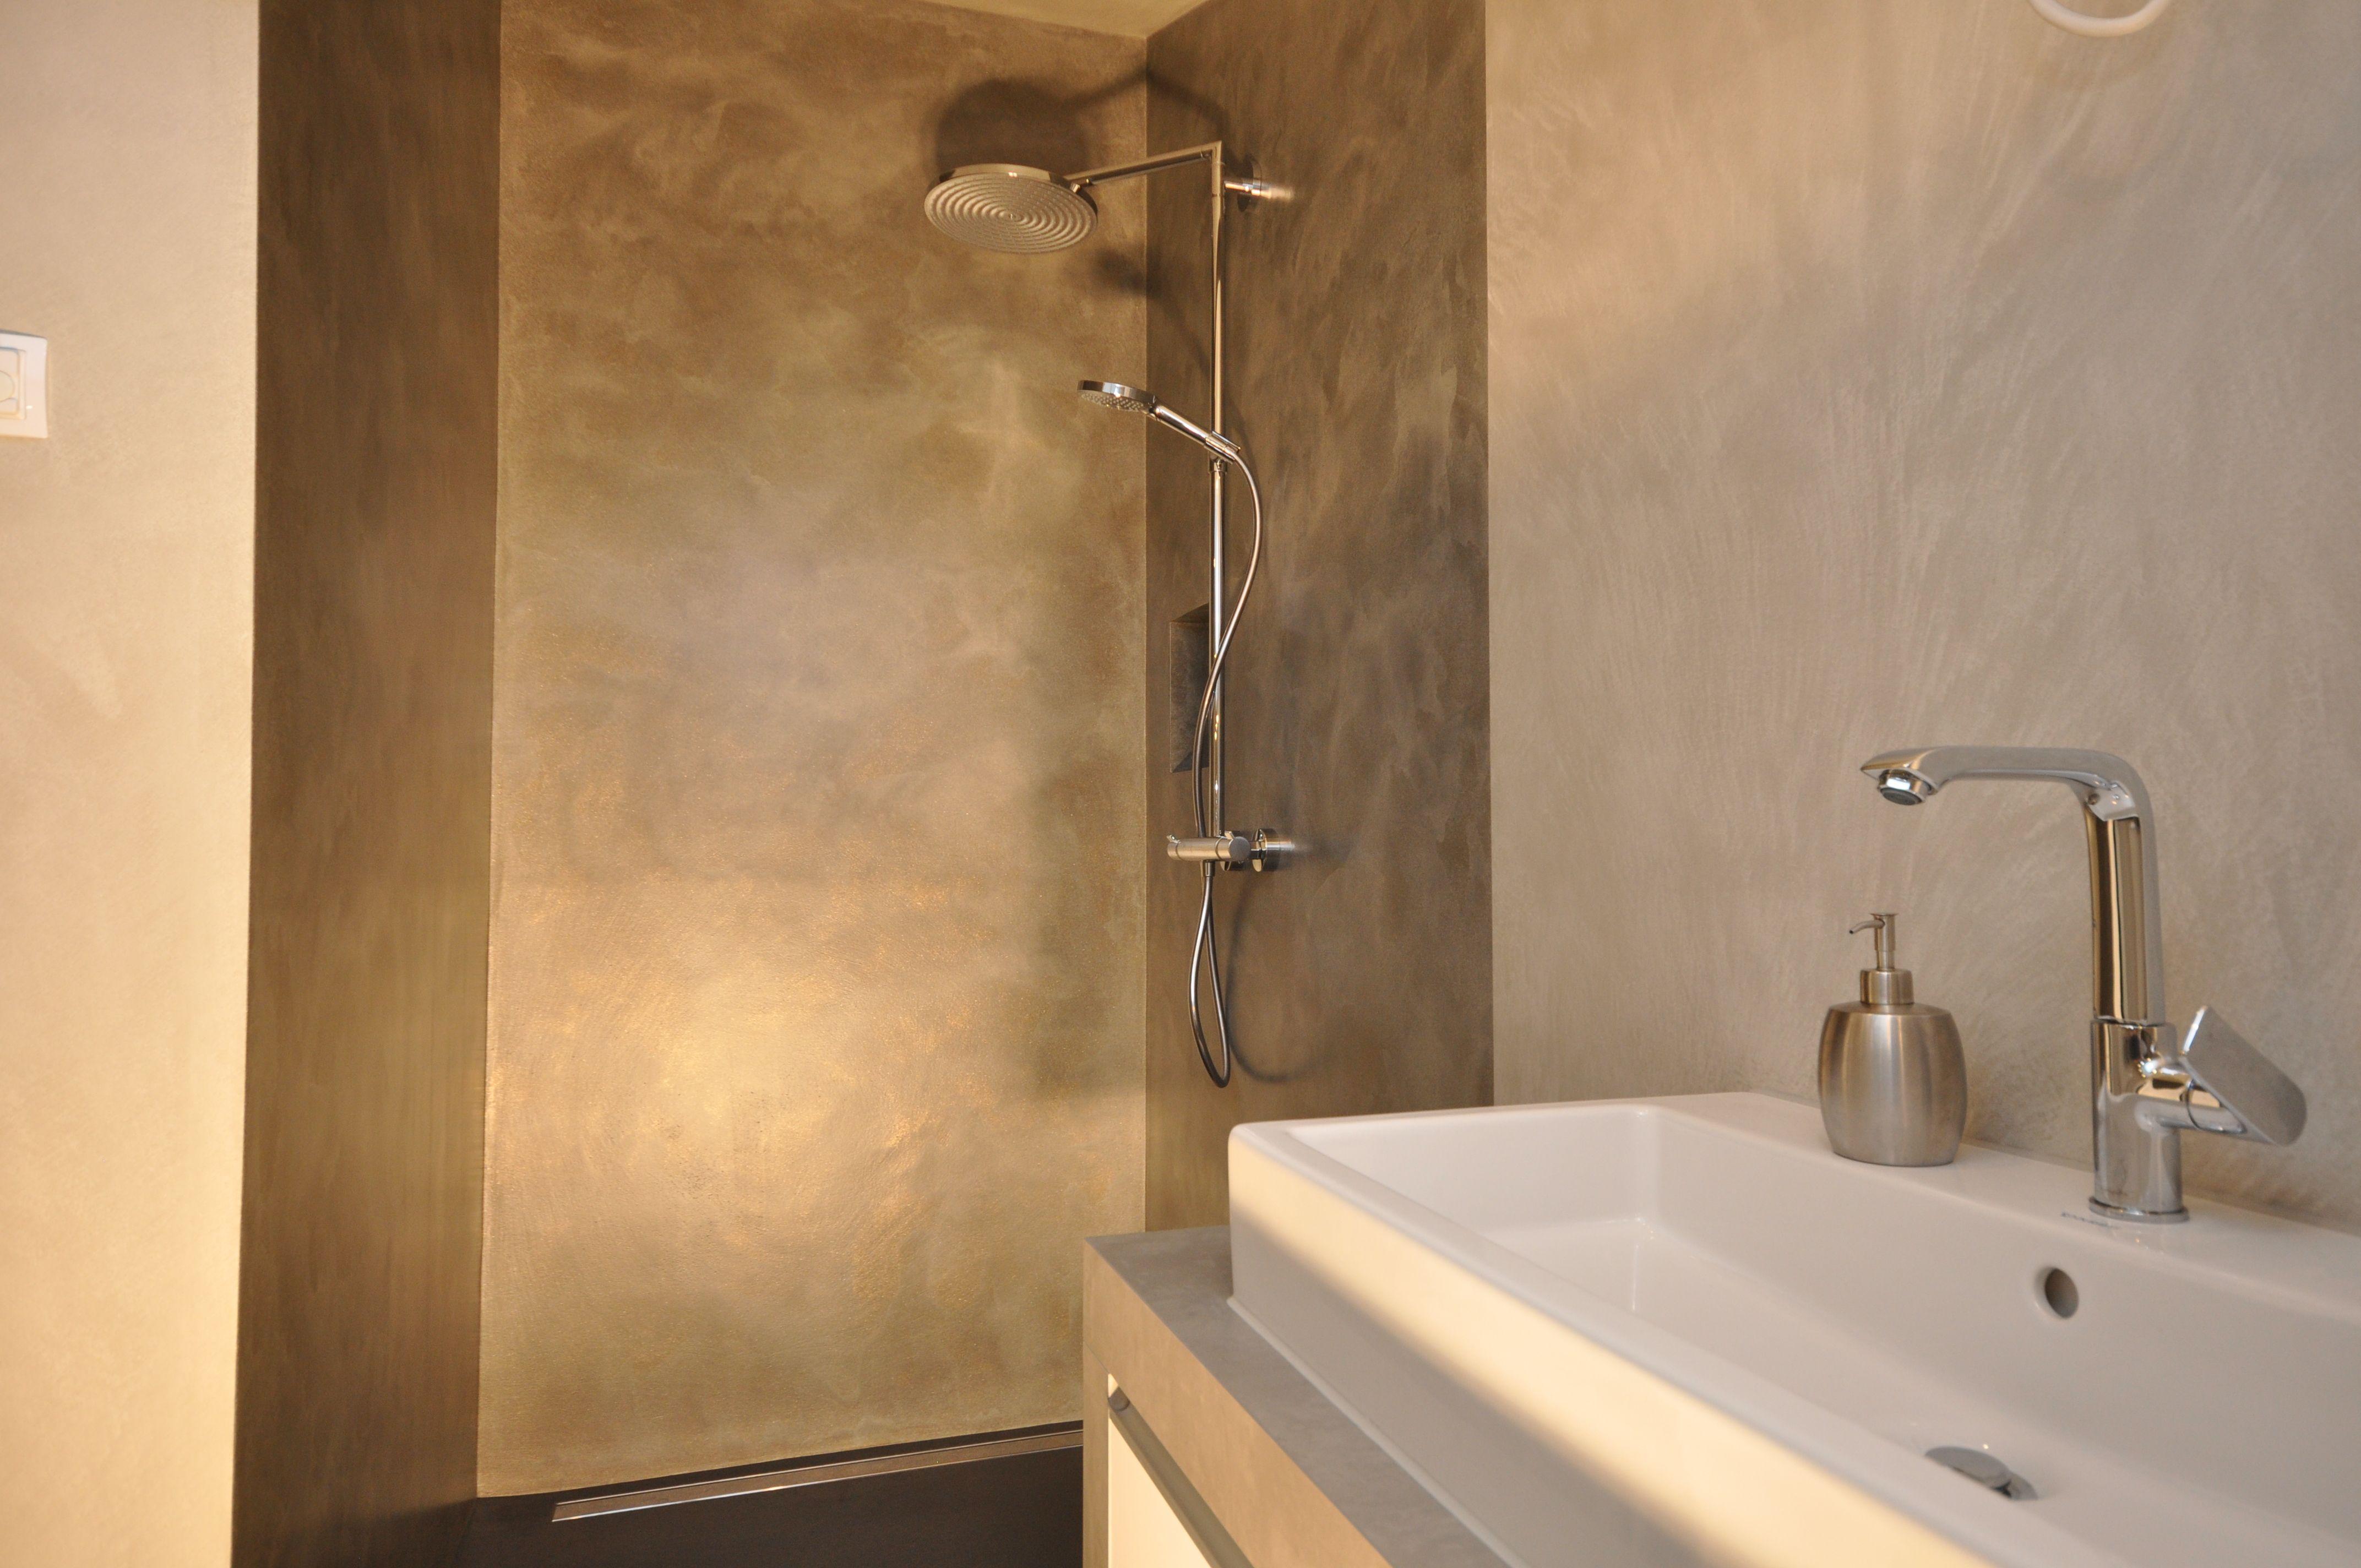 Kalk Marmor Putz Bad designbad • kalk-marmor-putz • fugenlose wandflächen • fugenloser